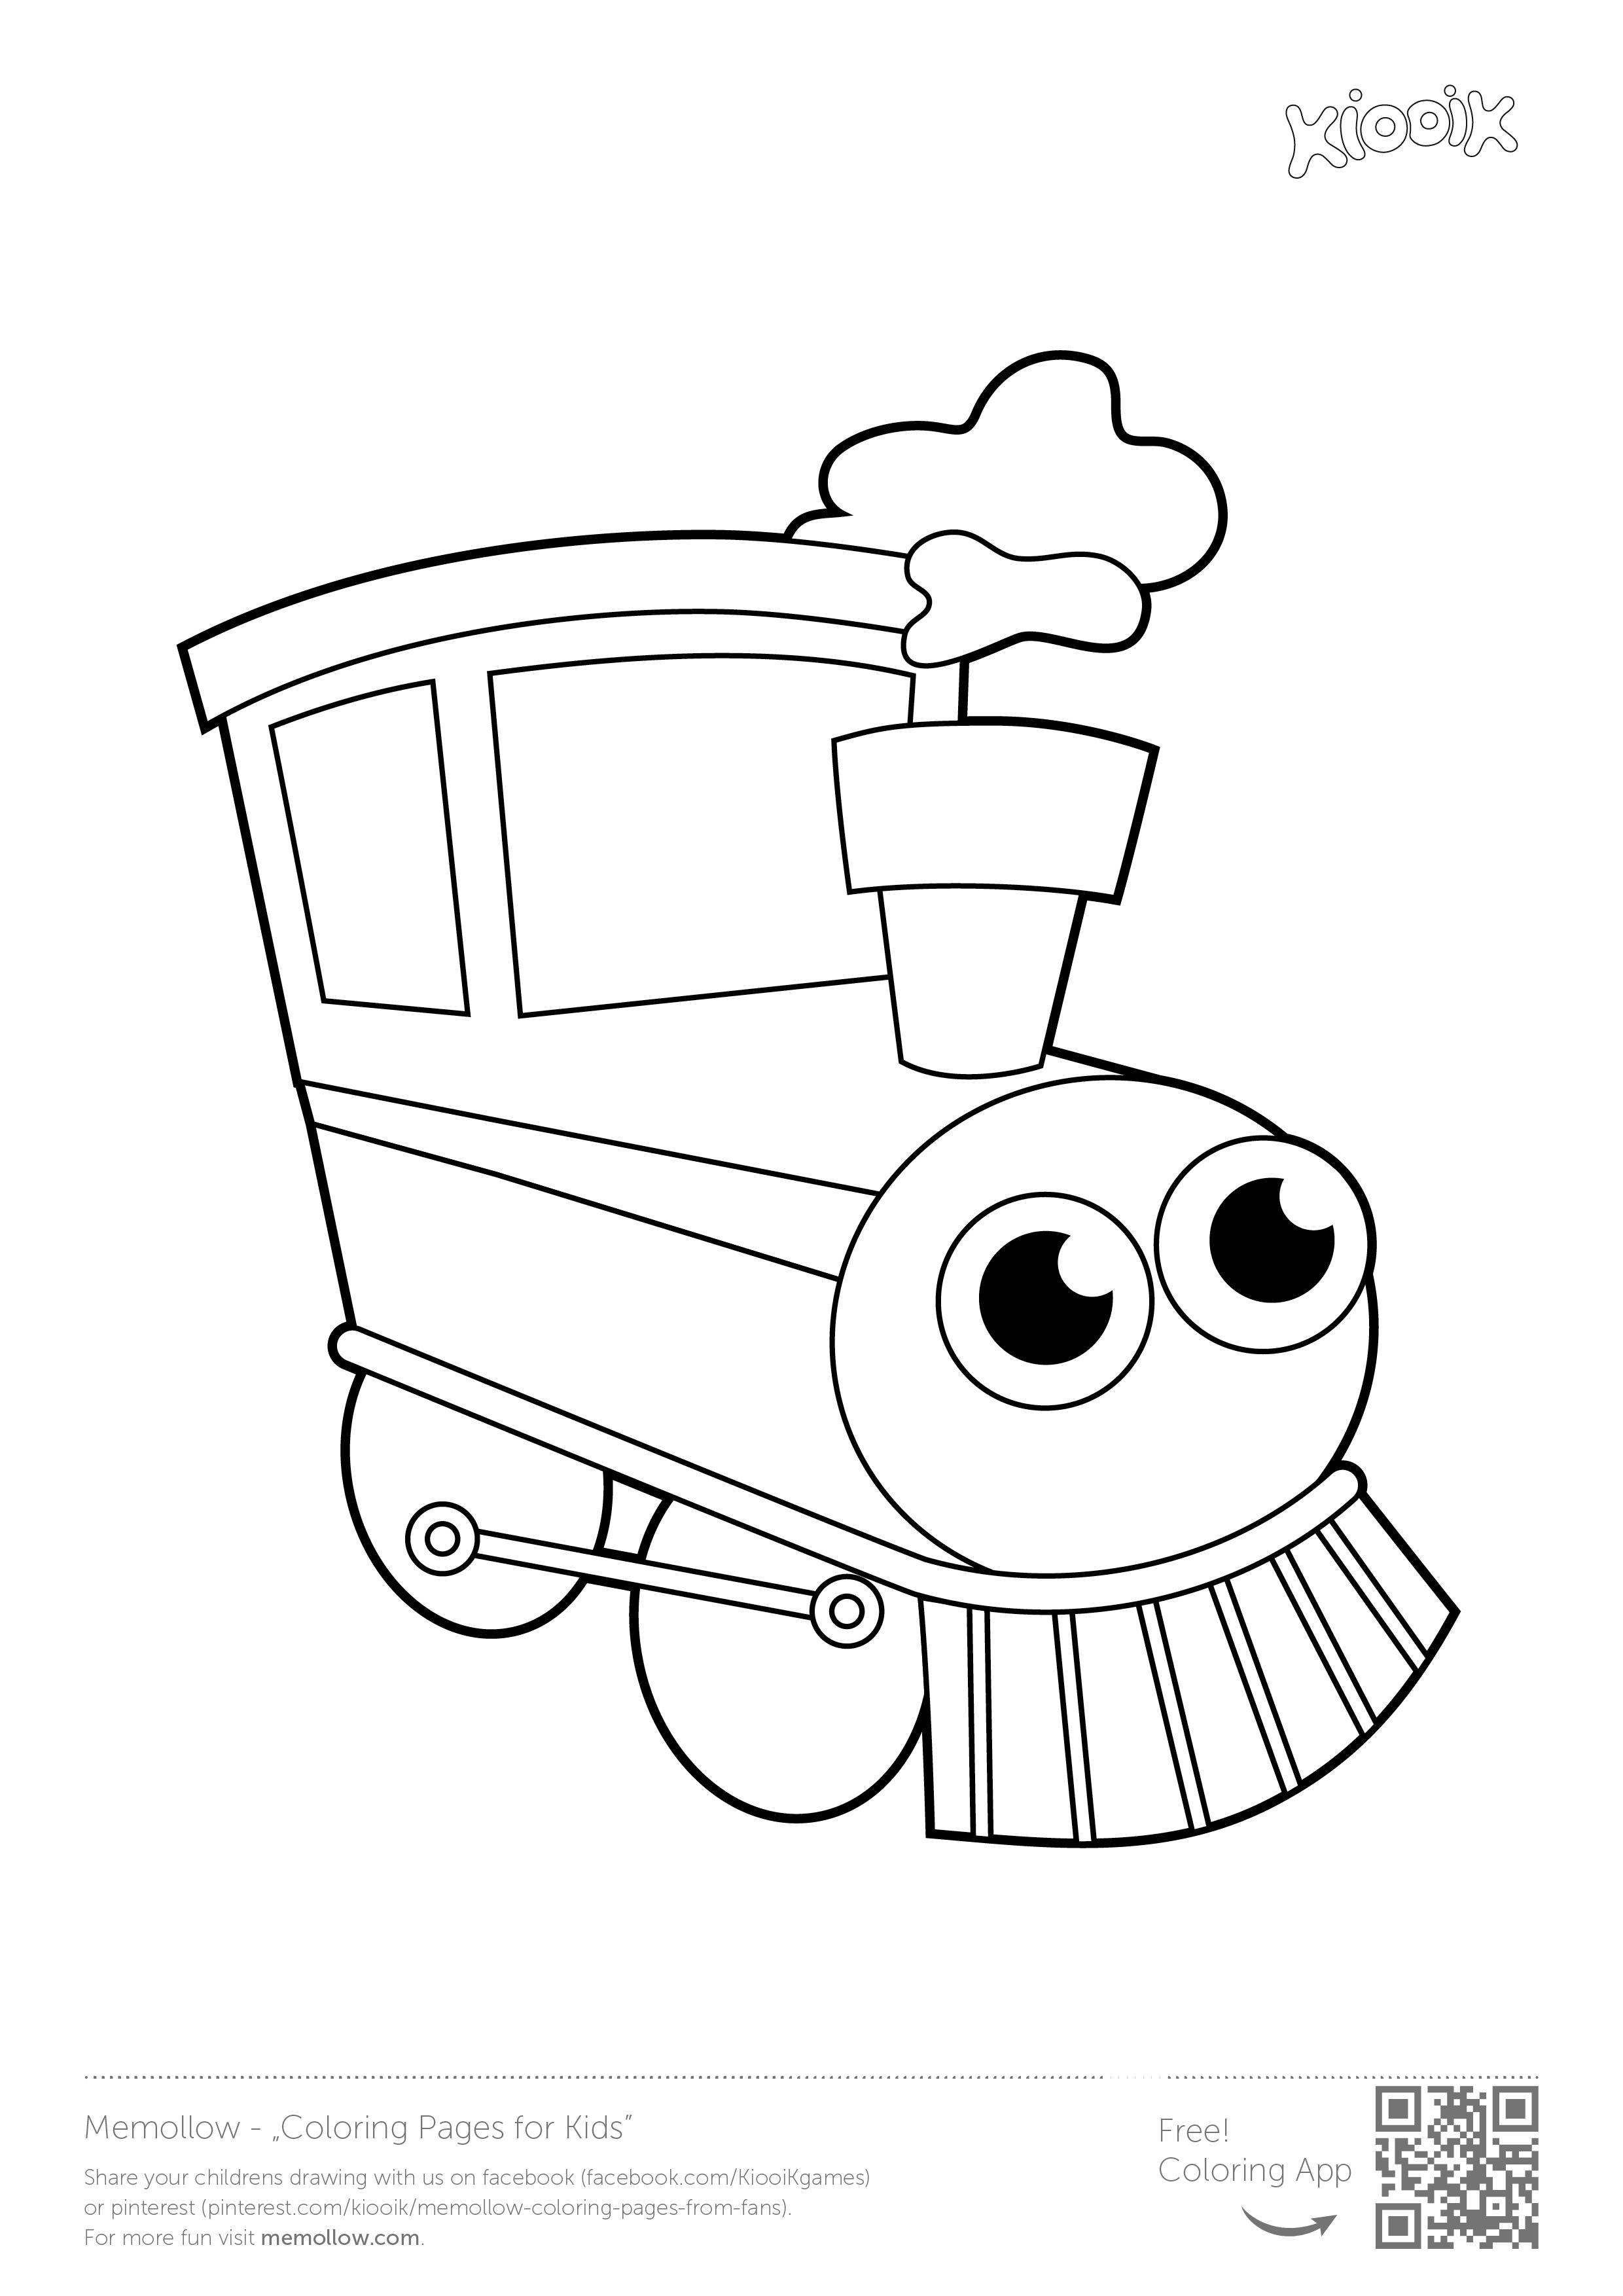 Locomotive\